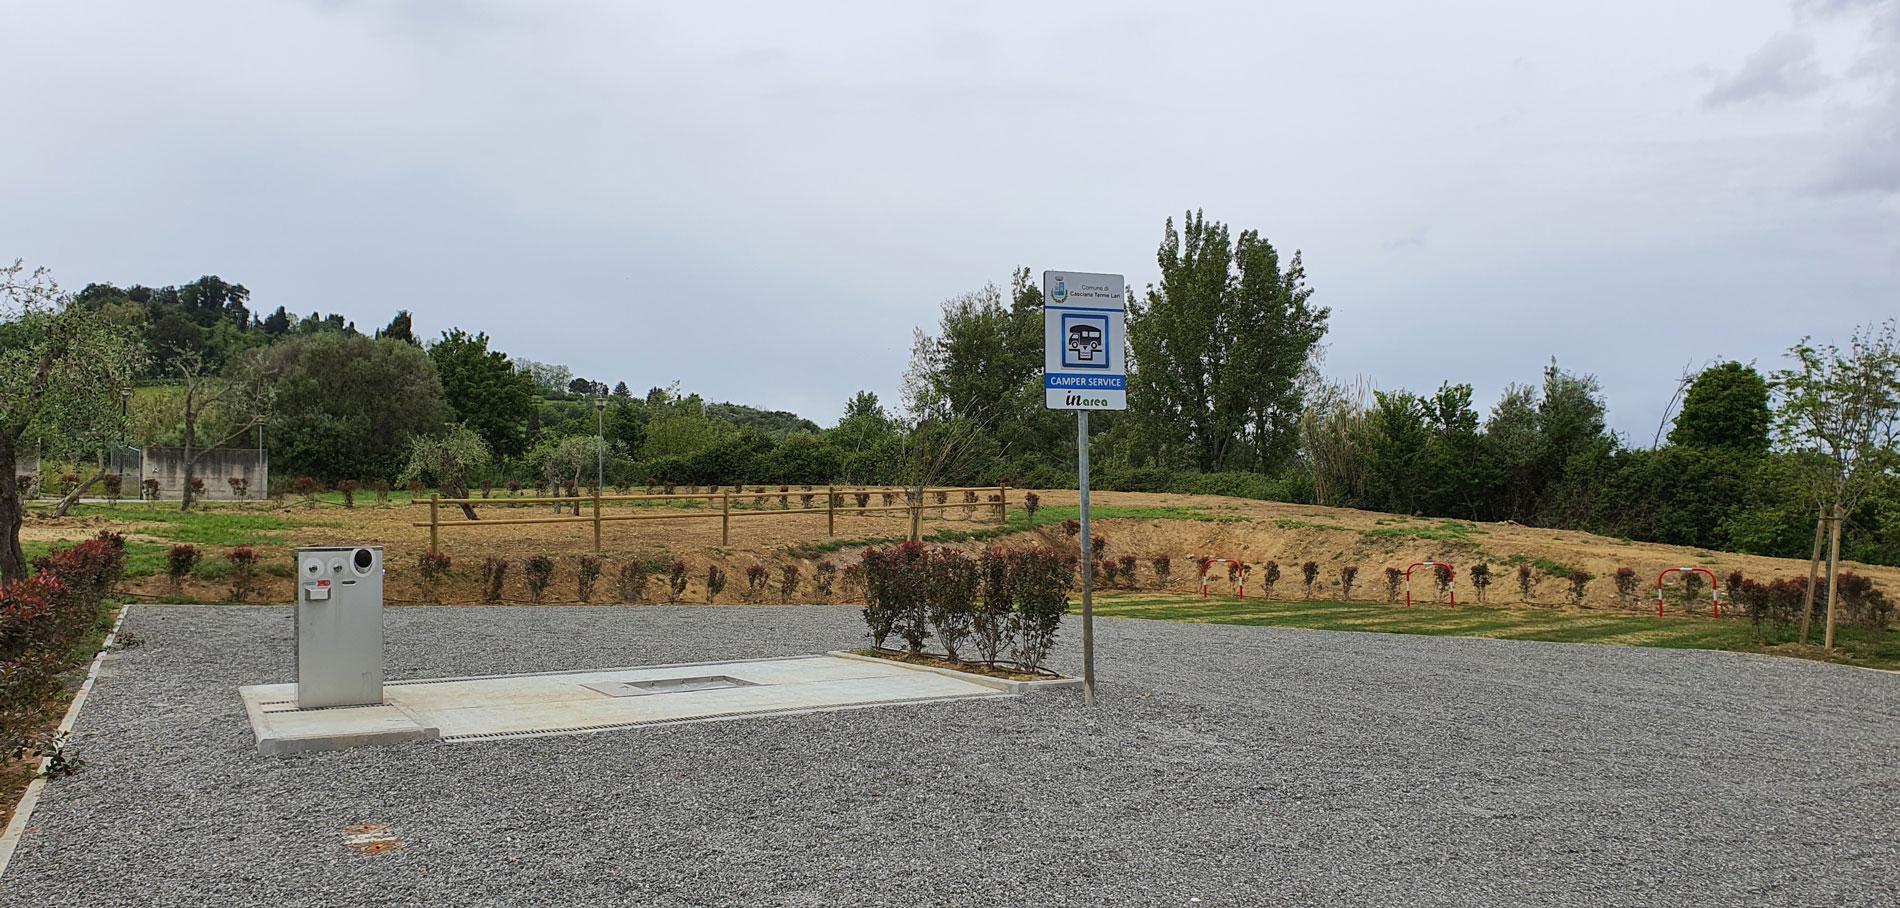 Area sosta camper Inarea a Casciana Terme Lari